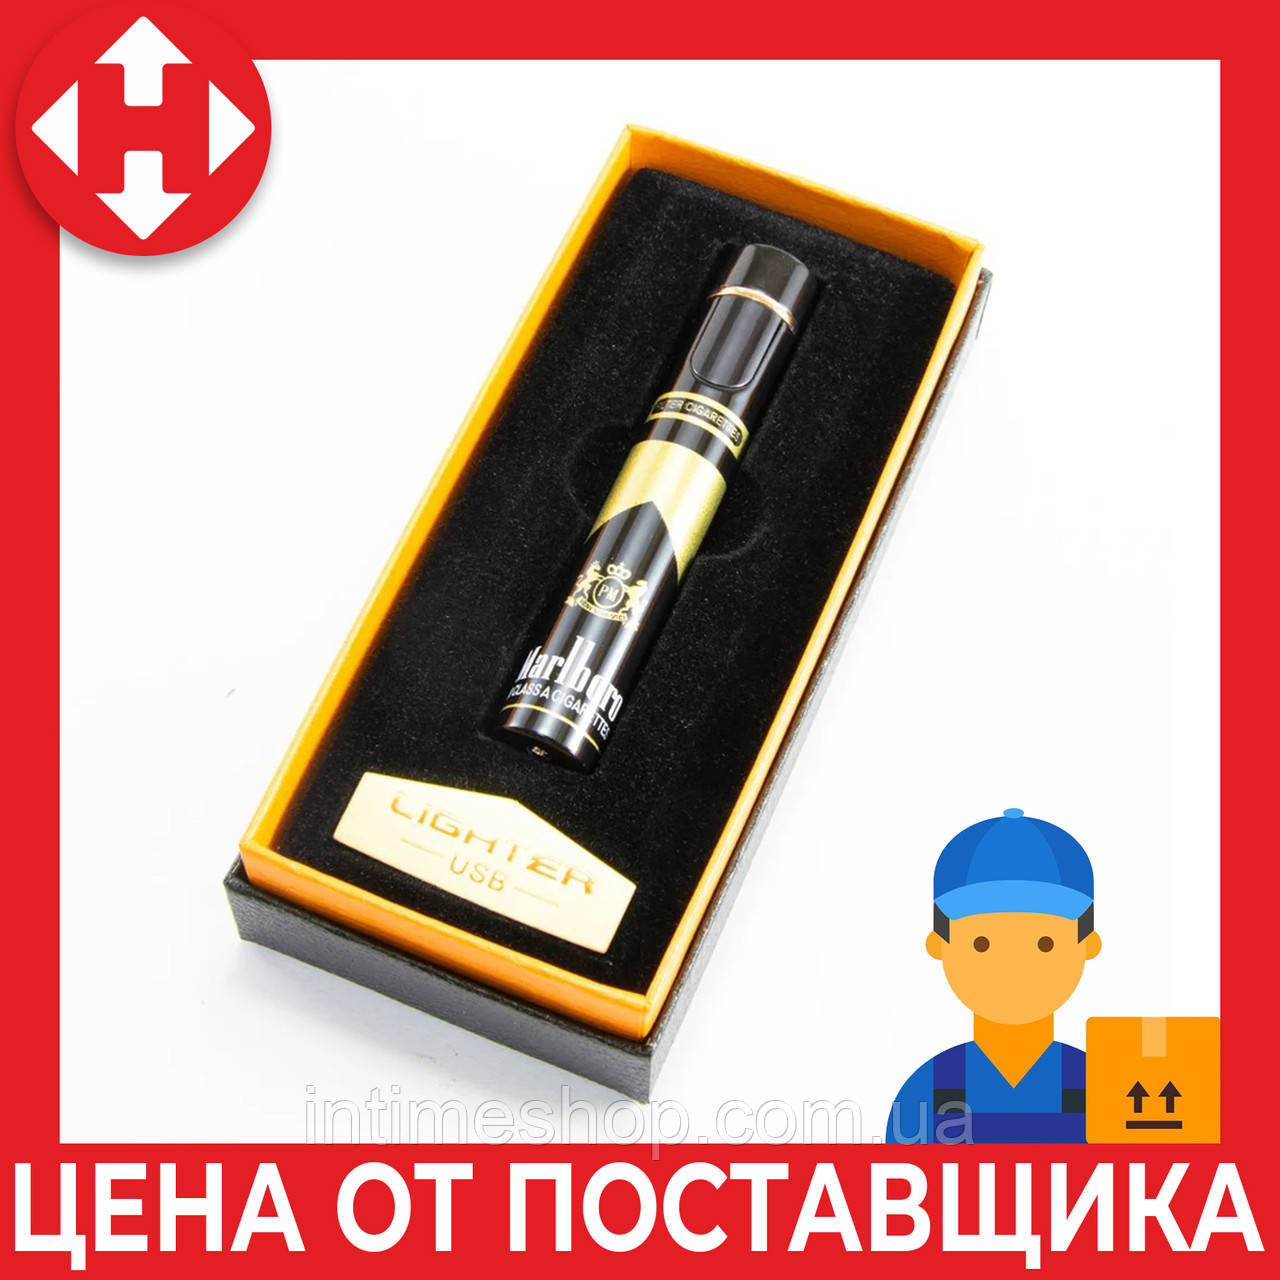 Распродажа! Спиральная сенсорная аккумуляторная зажигалка, Marlboro (Art 113) Черная, электрозажигалка от юсб